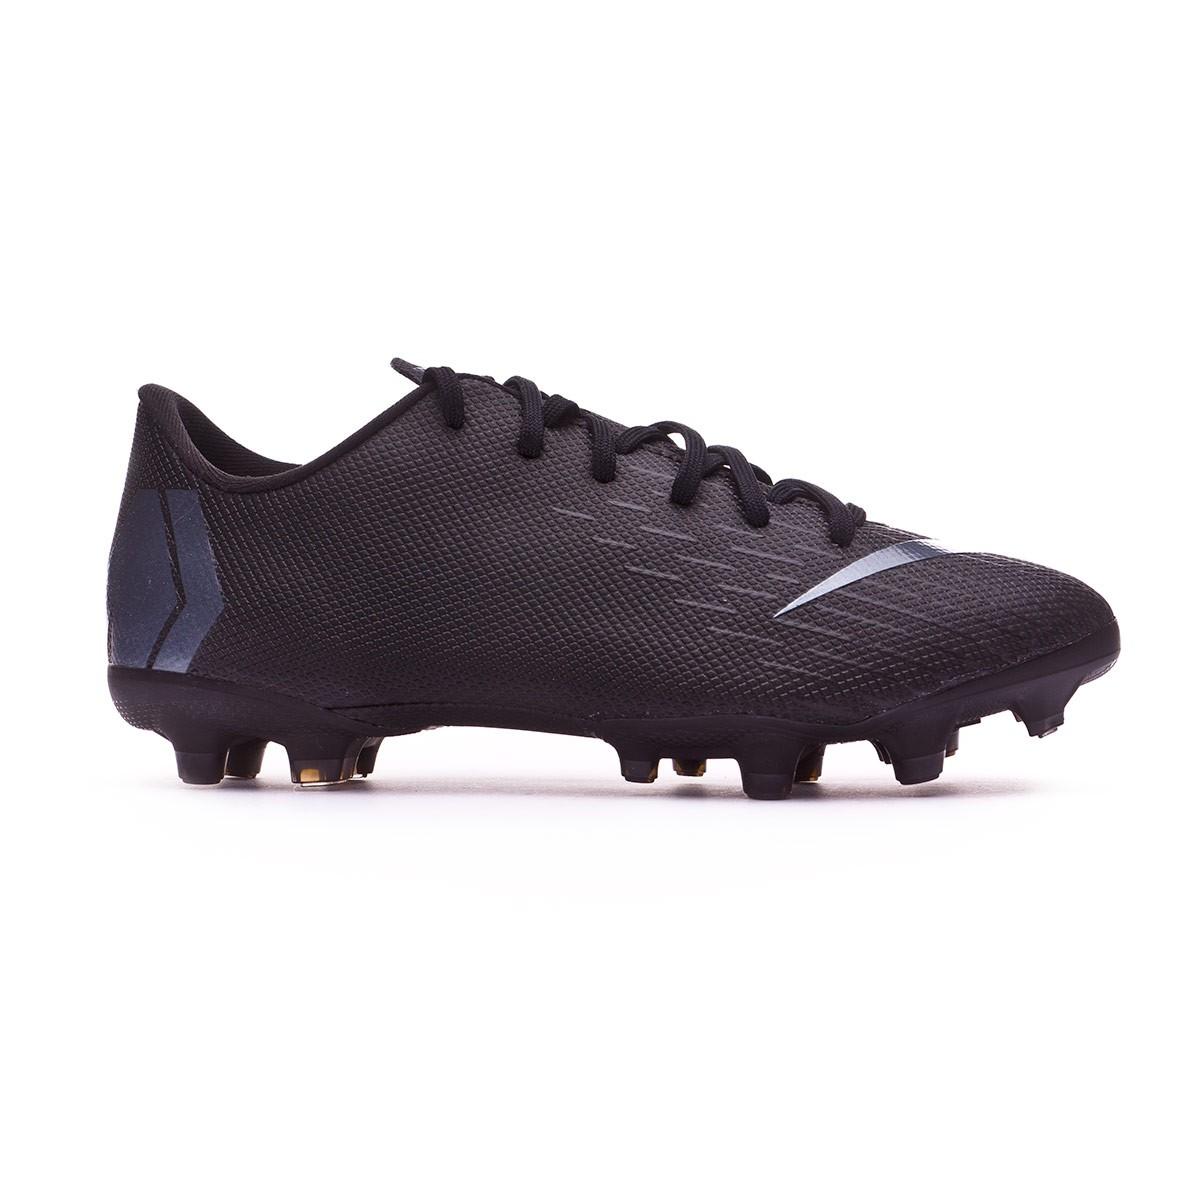 new arrival 7b0c9 2bd4e ... Bota Mercurial Vapor XII Academy GS MG Niño Black. CATEGORY. Football  boots · Nike football boots